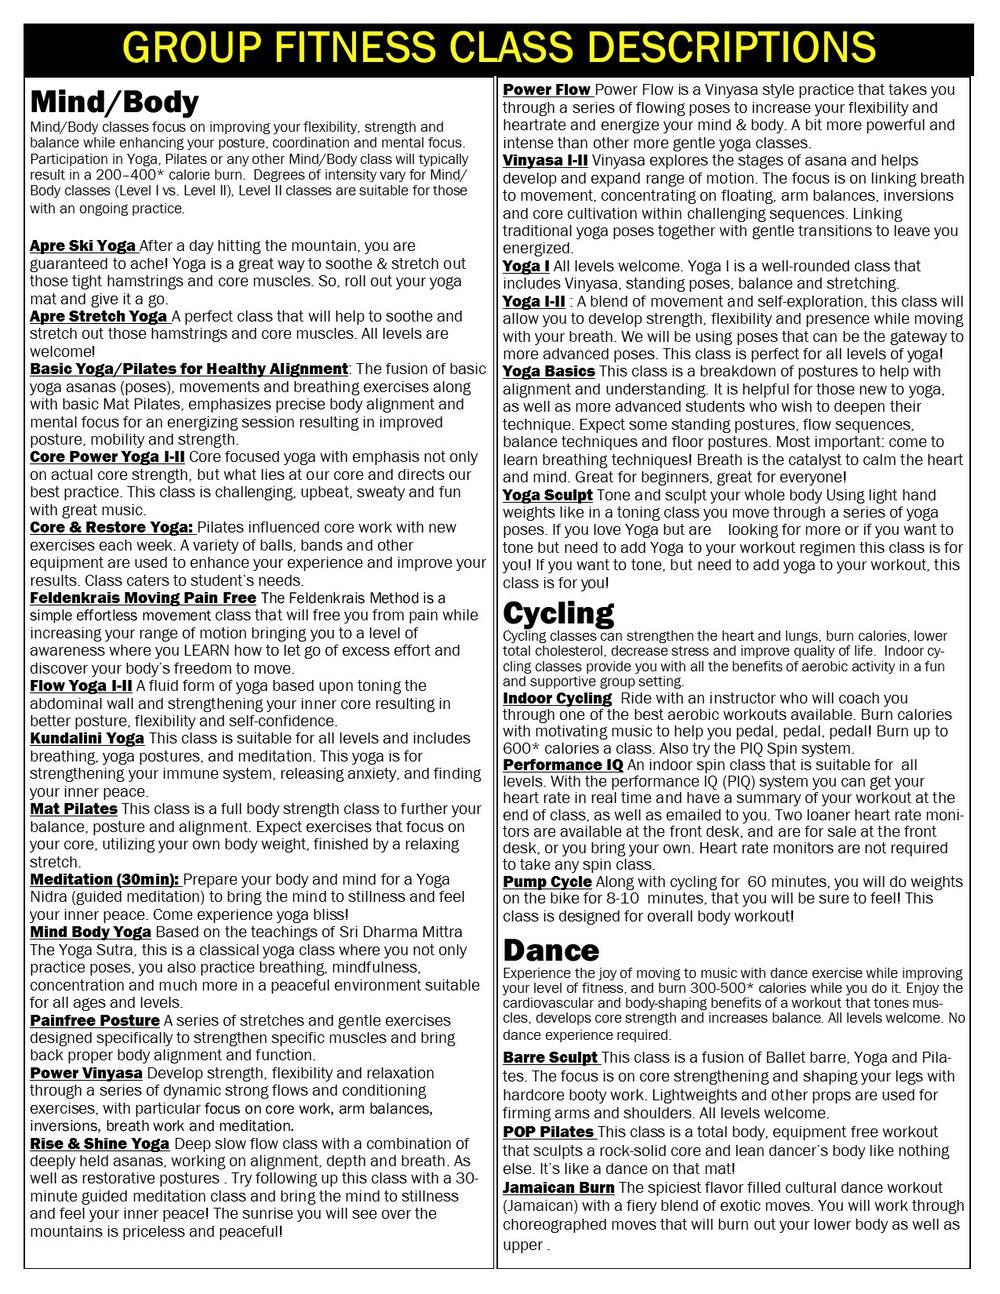 Class Descriptions Page 2 - JPEG.jpg